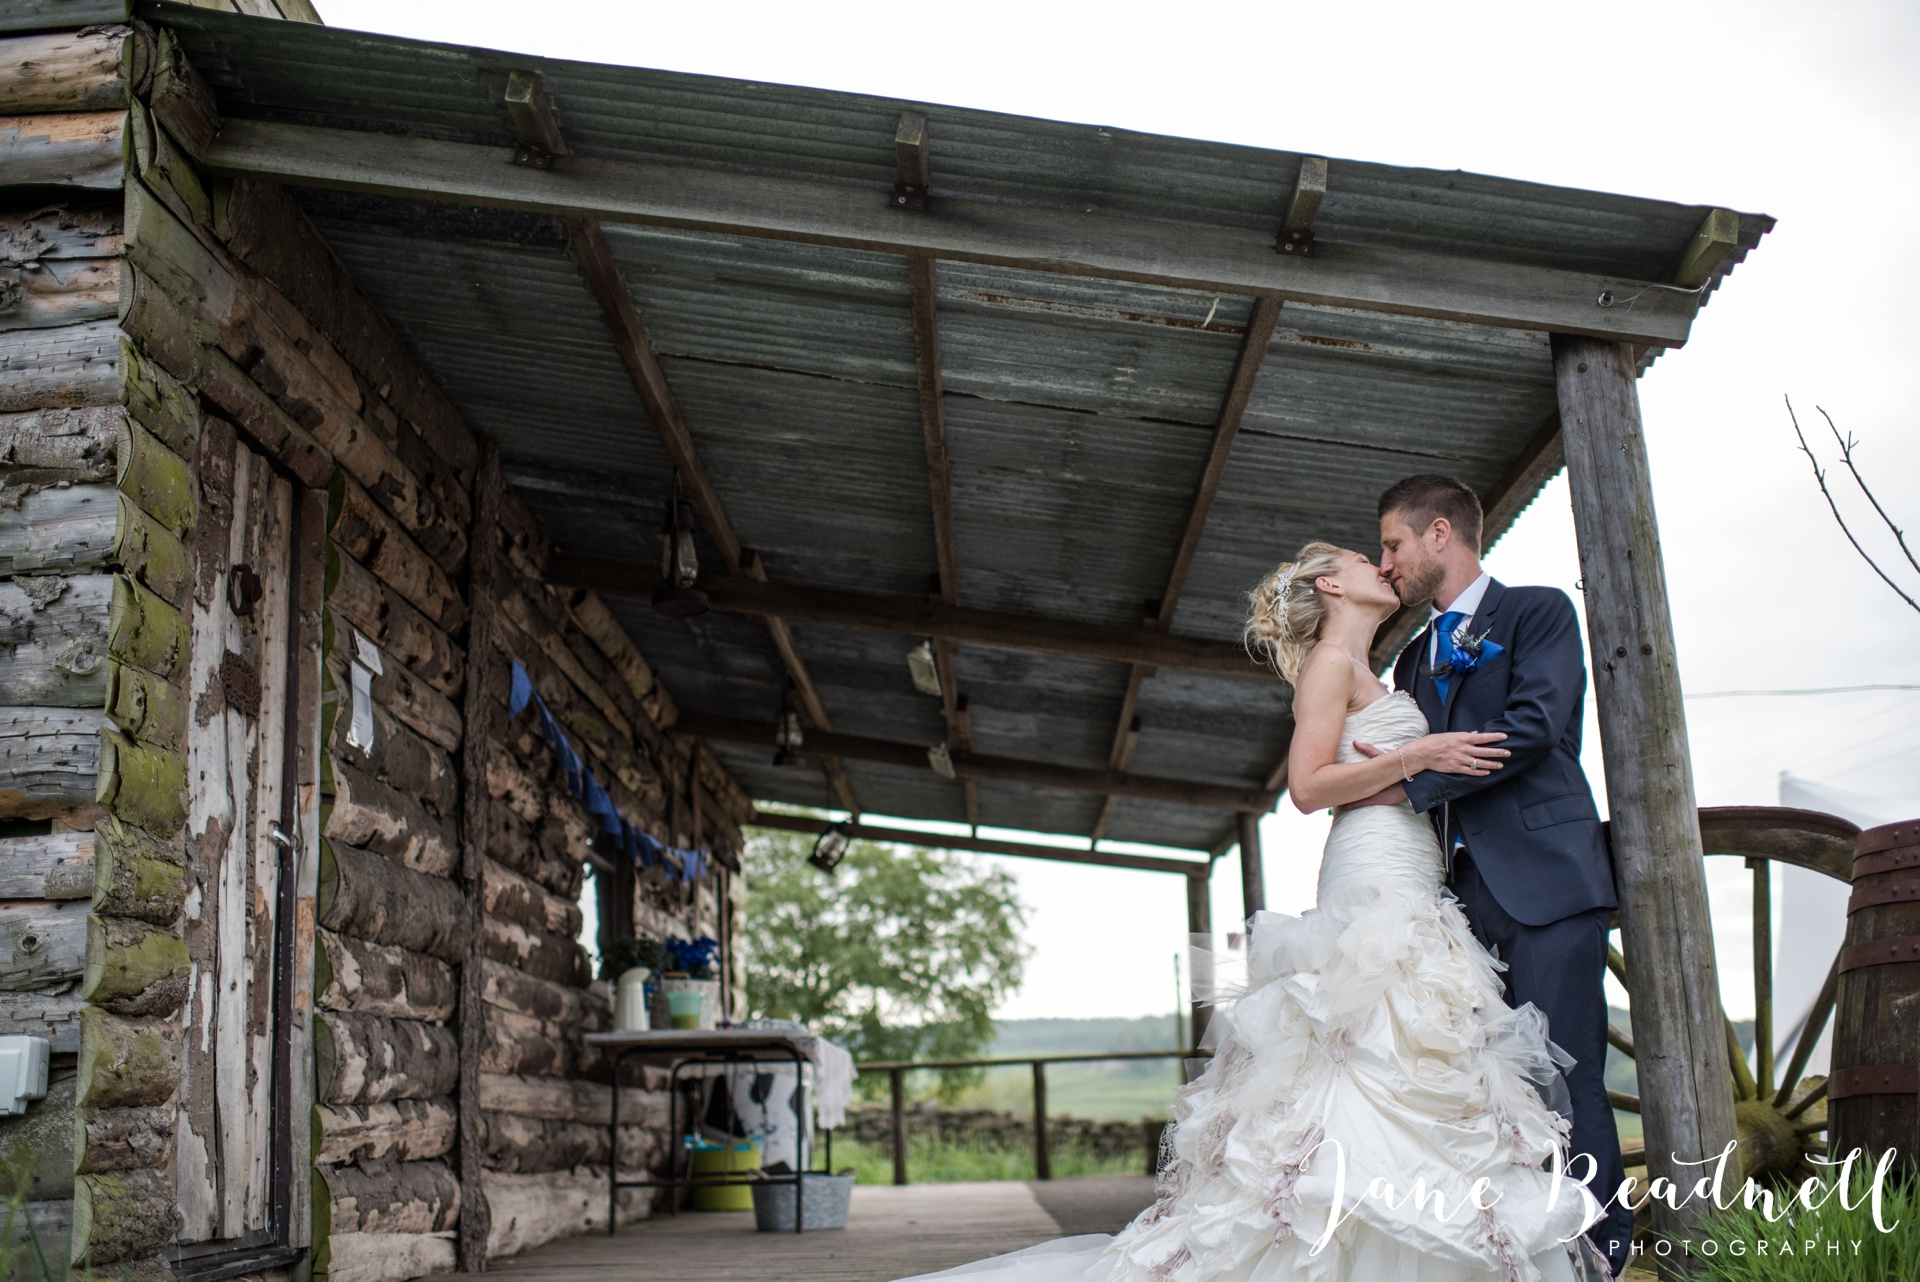 Hill Top Farm Wedding Photography Masham by Jane Beadnell Photography_0074